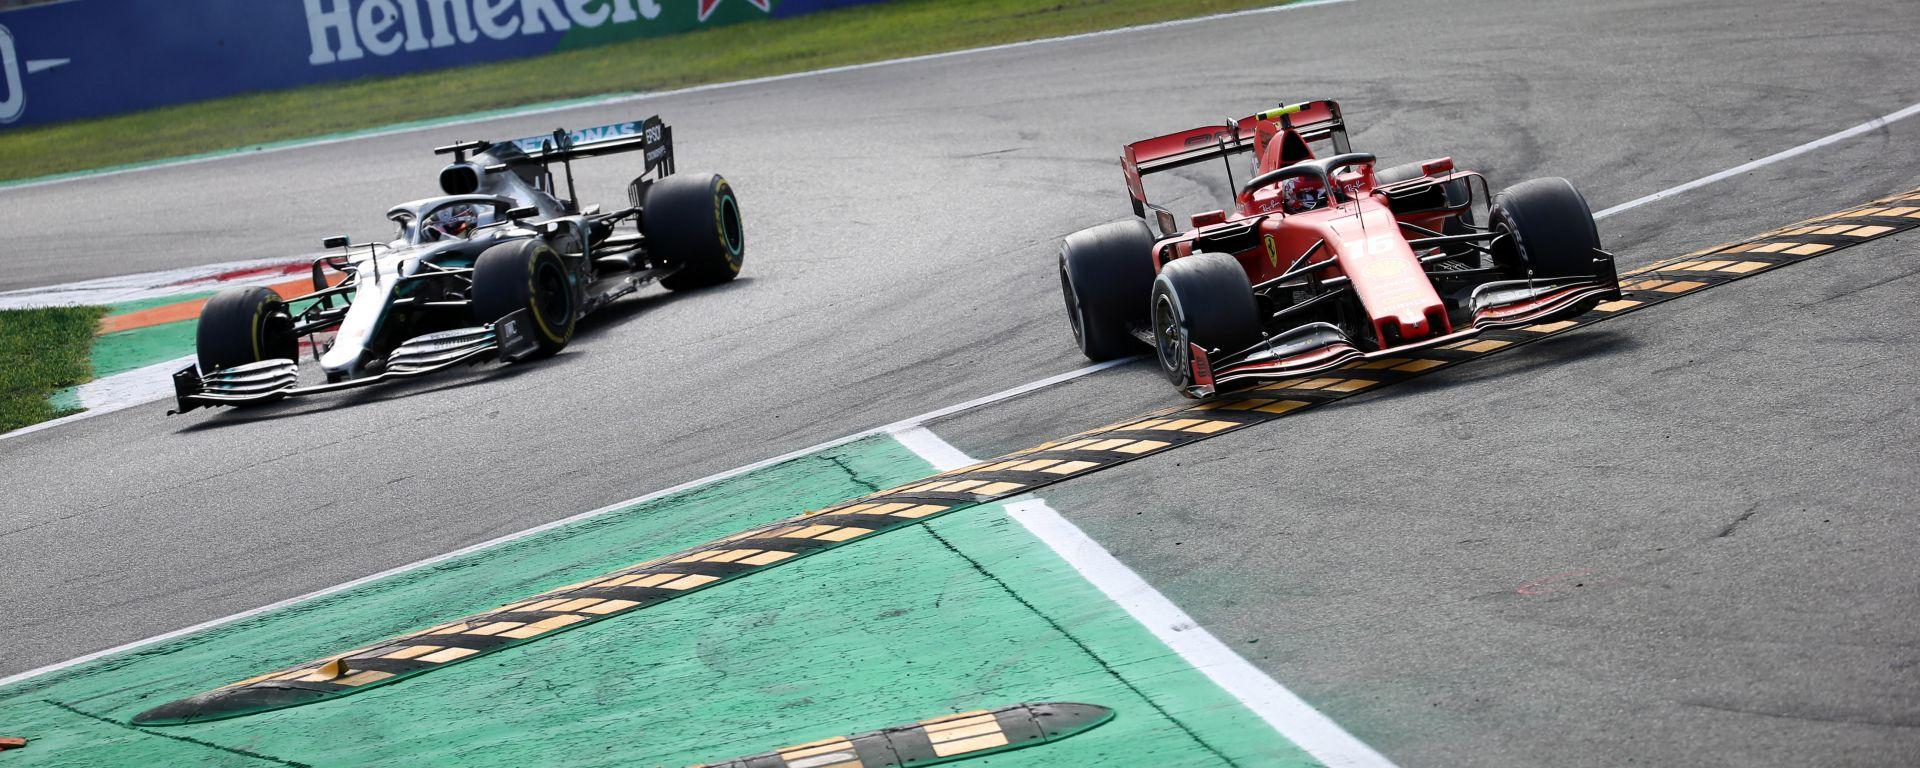 F1 GP Italia 2019, Monza: Charles Leclerc (Ferrari) e Lewis Hamilton (Mercedes)